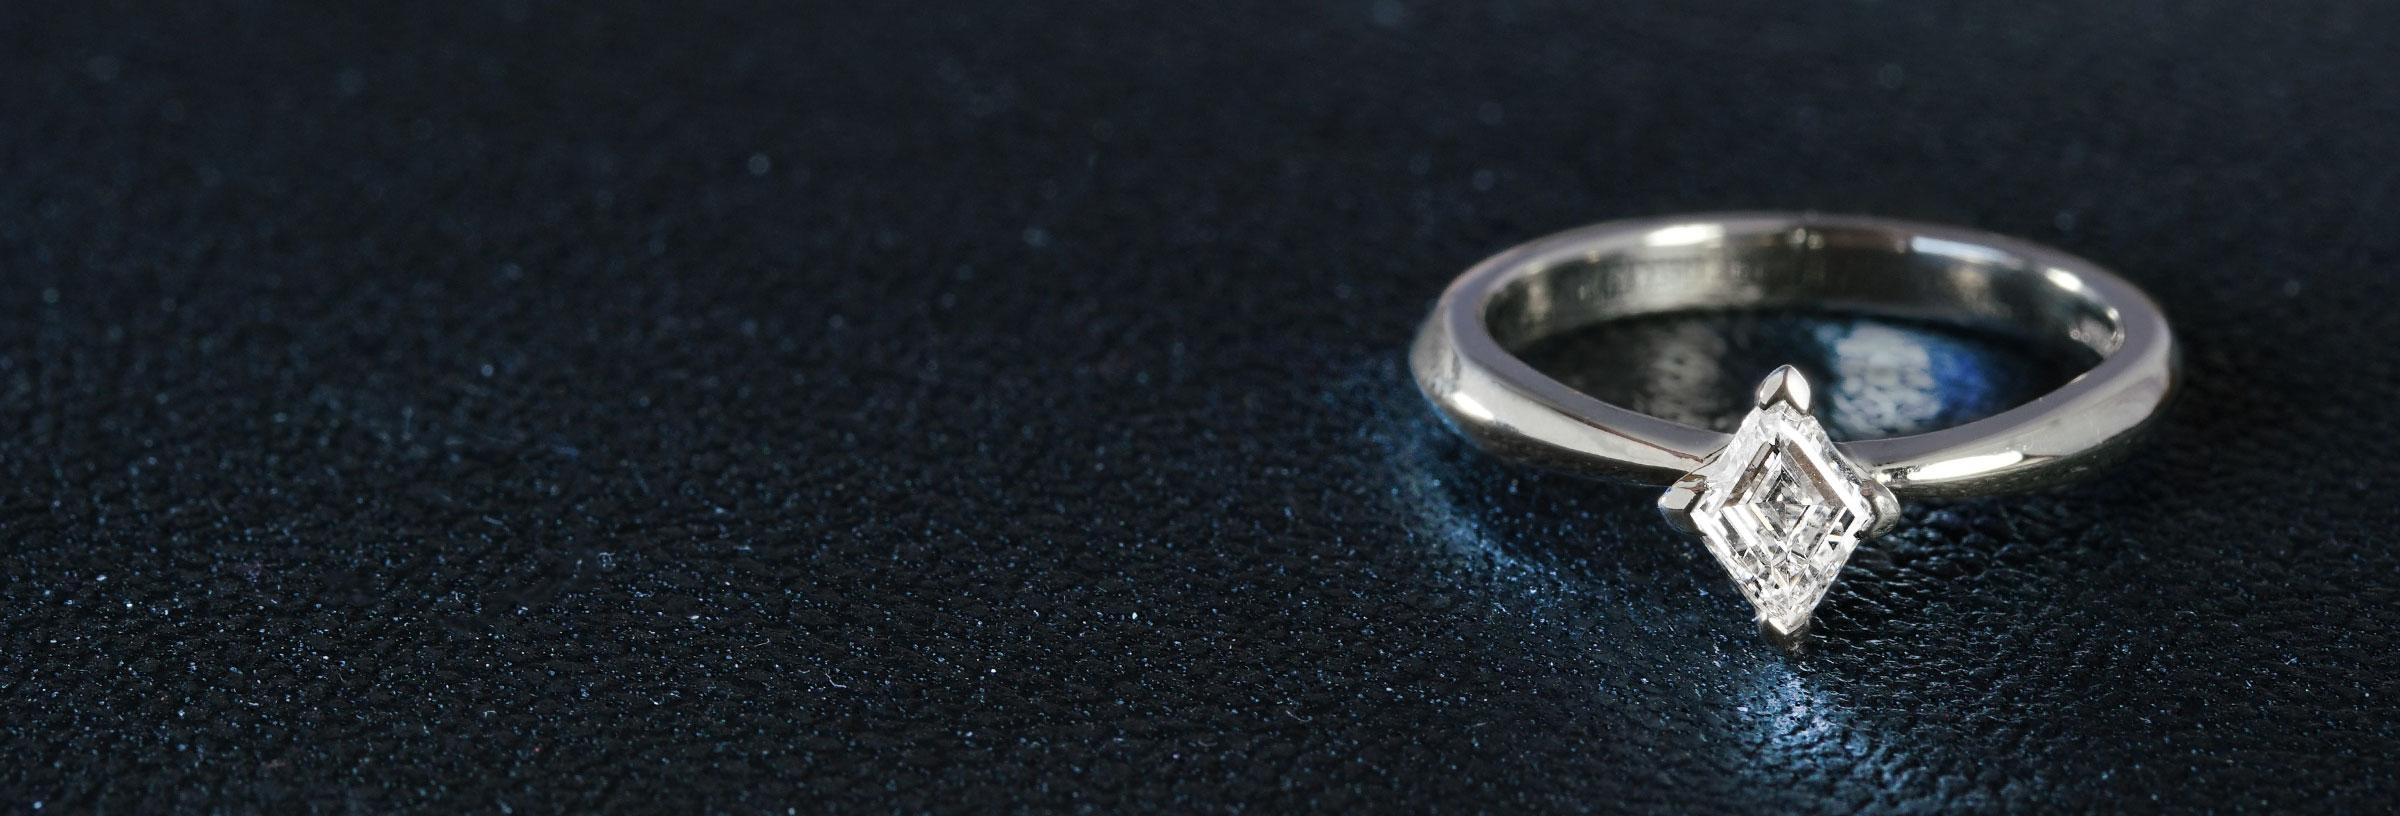 apex-palladium-and-kite-cut-diamond-engagement-ring